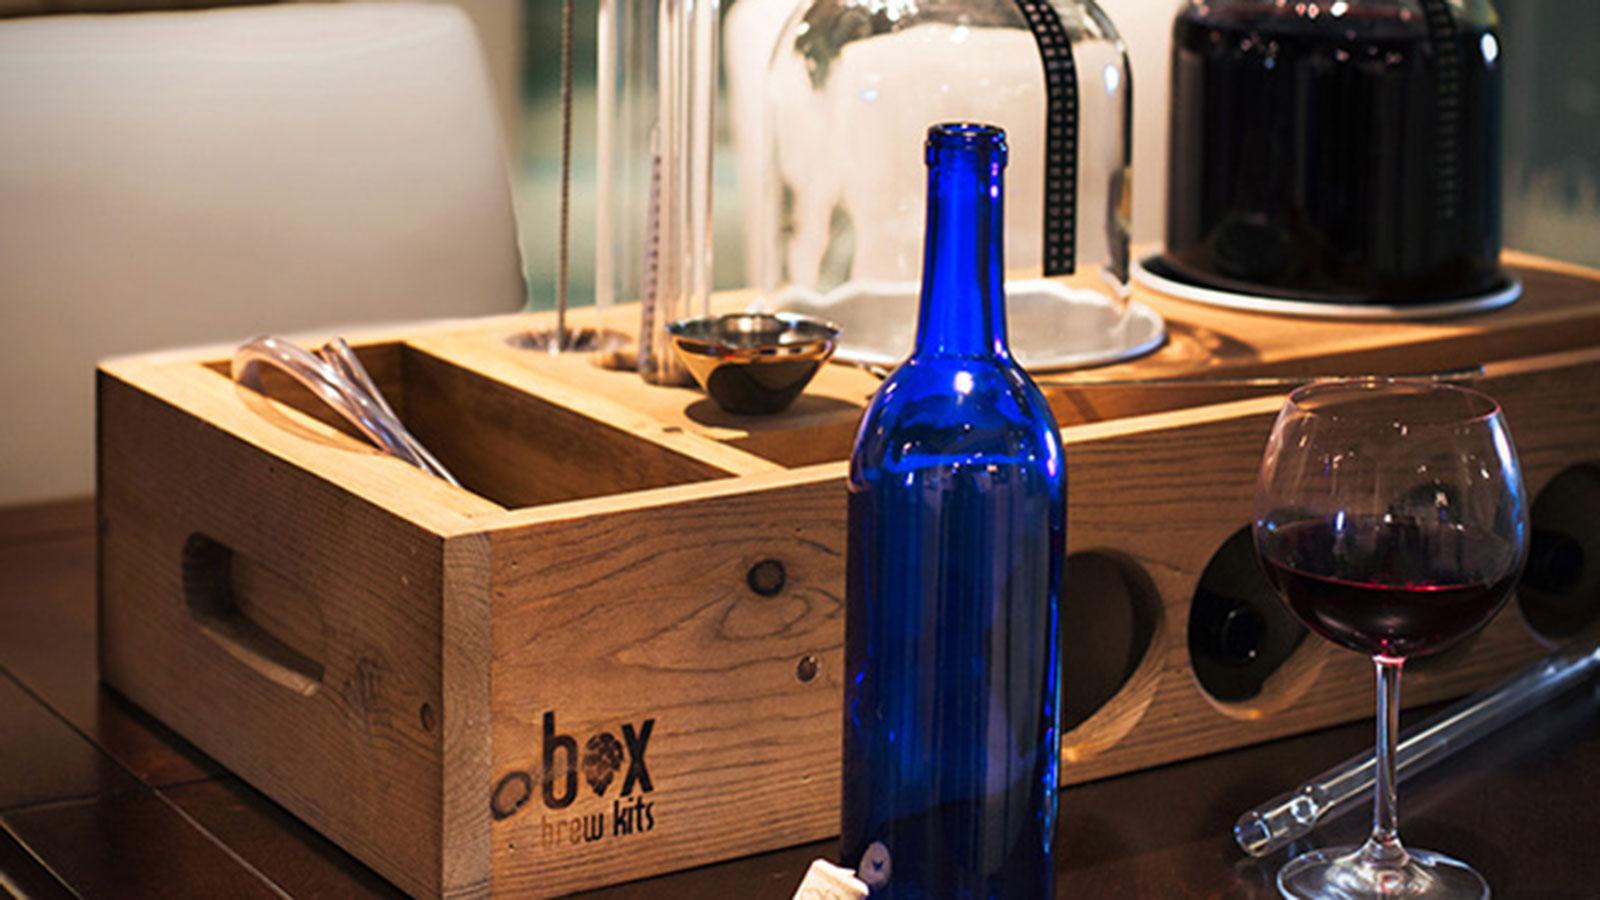 Box-Brew-Winemaking-Kit-4